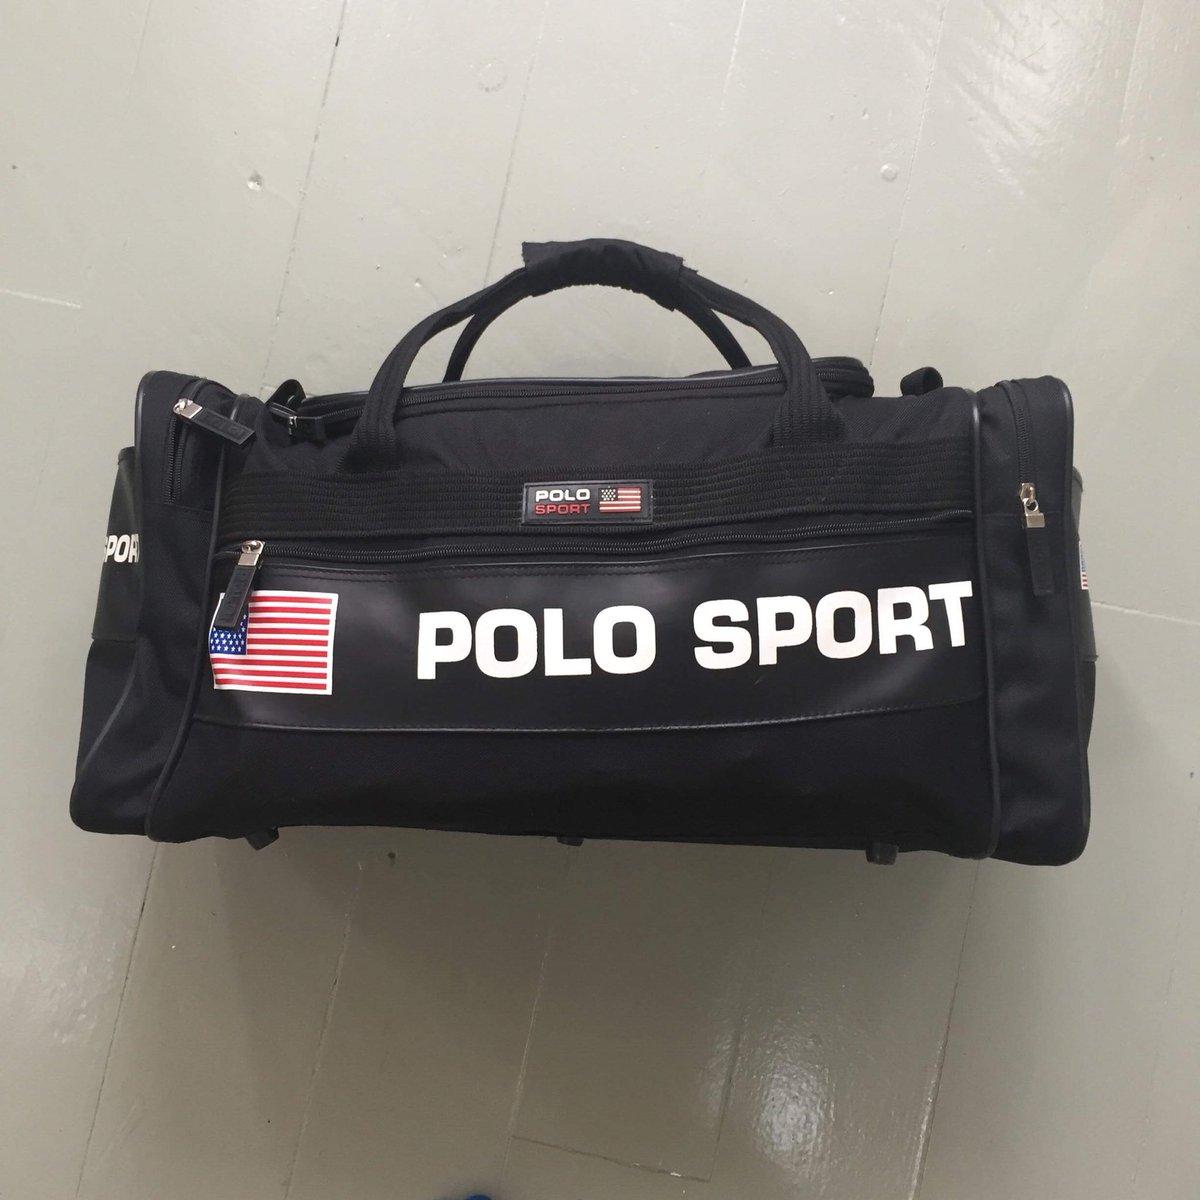 55e6691e79 ... promo code for price 60 bag bags duffelbag duffel suitcase polo sport  polosport ralph usa lauren discount ...